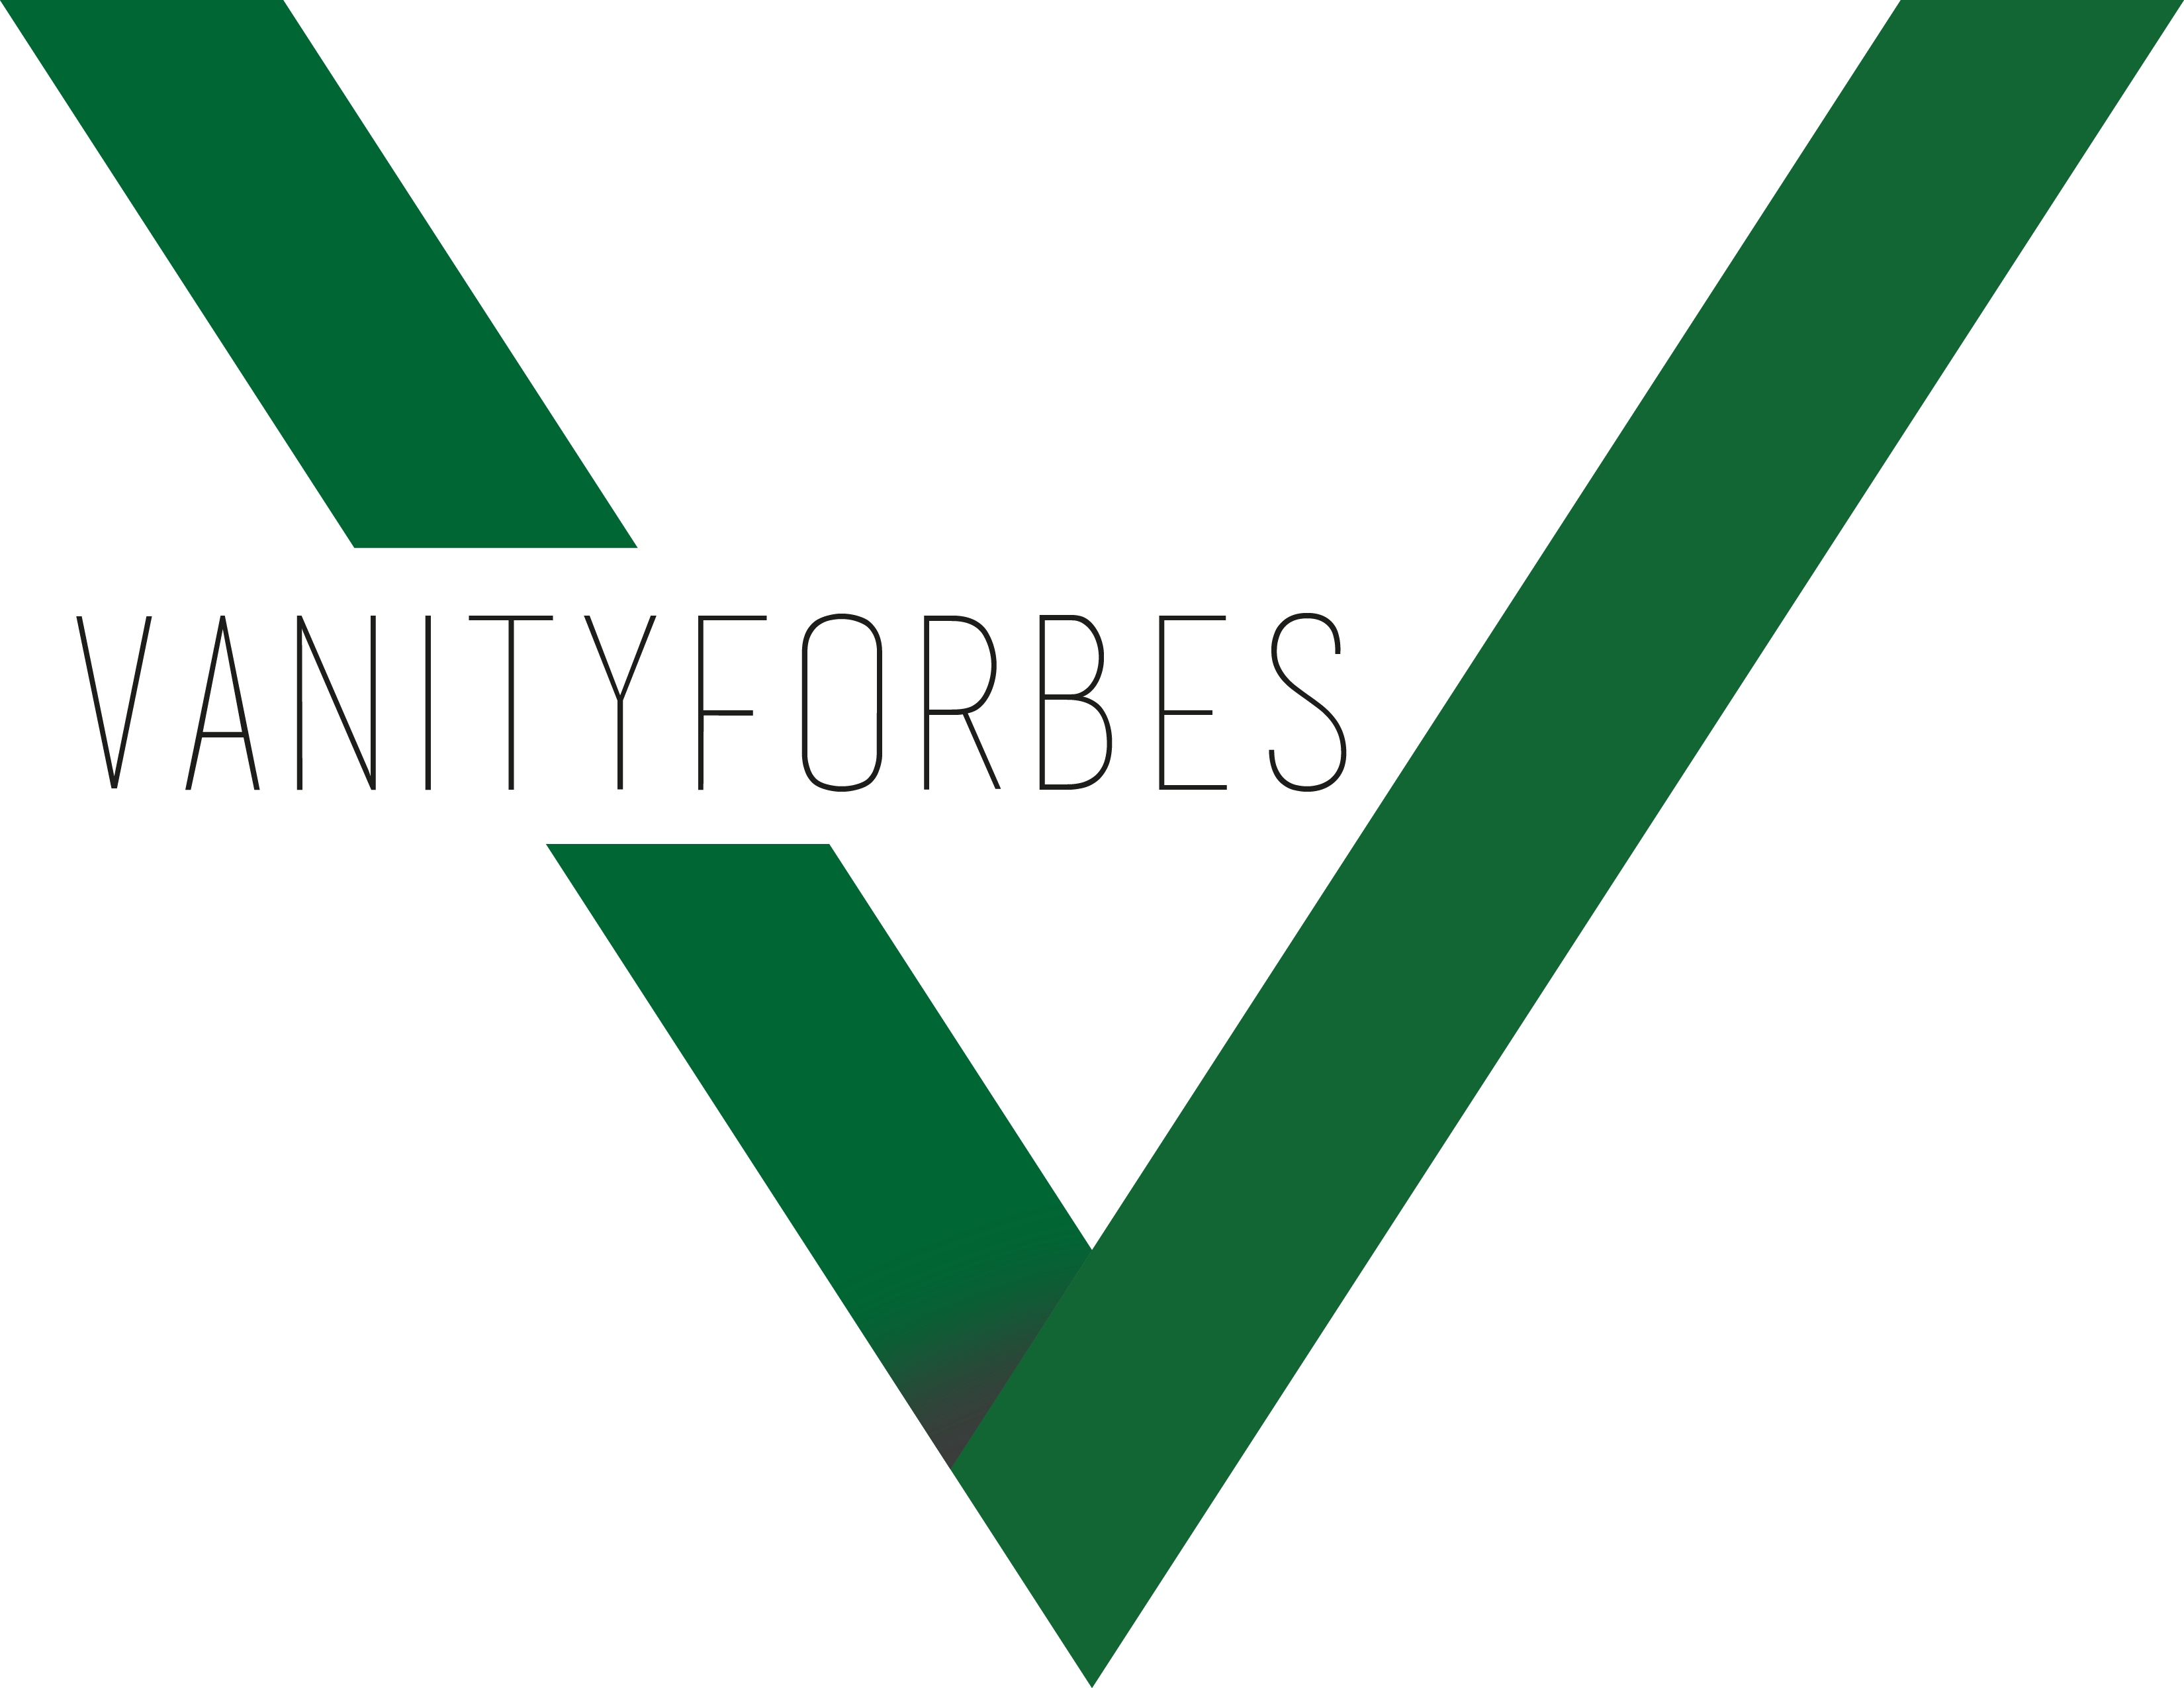 VanityForbes